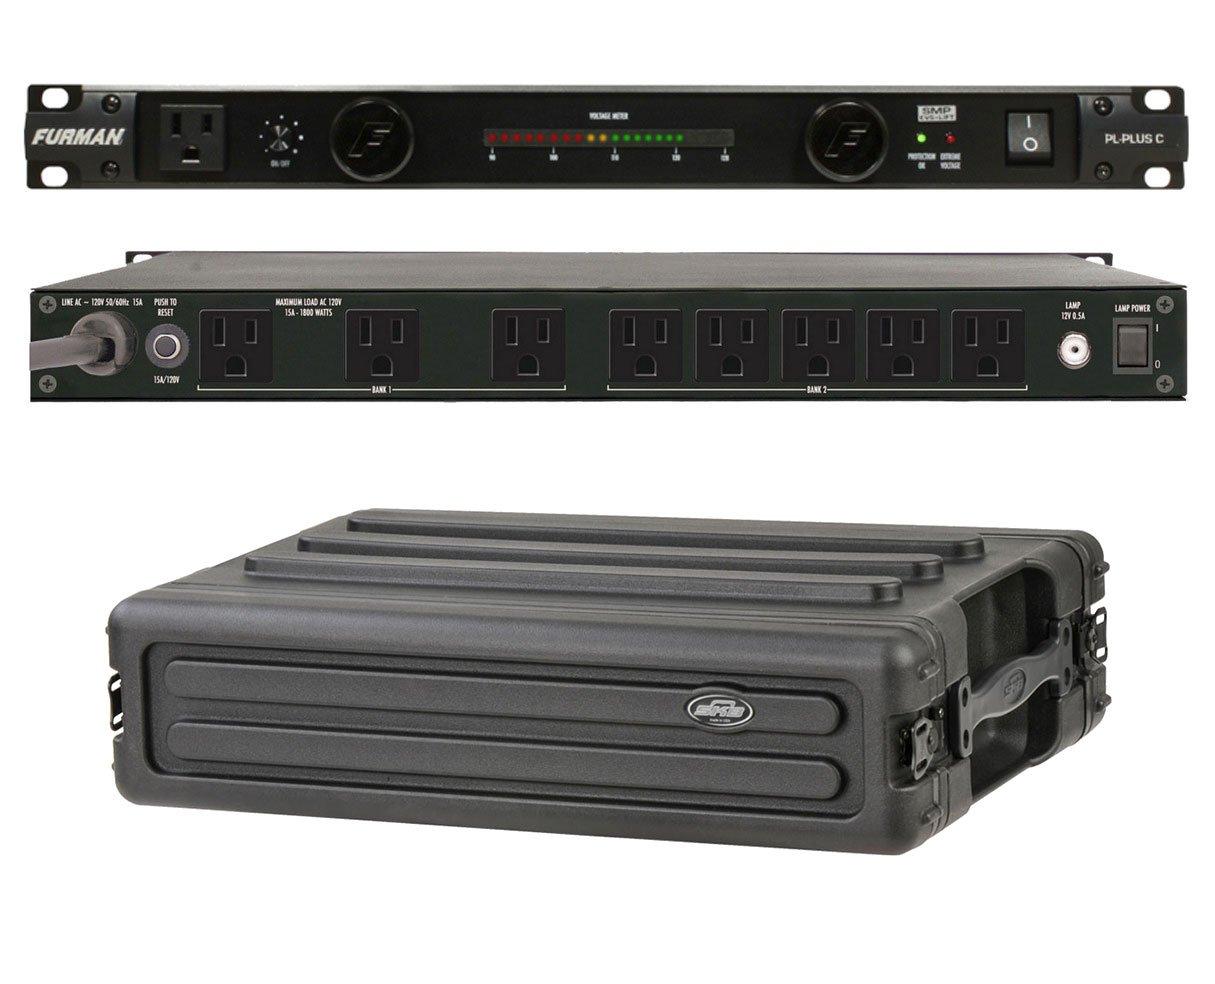 Furman PL-Plus C 15 Amp Power Conditioner + SKB 1SKB-R2S 2U Shallow Rack